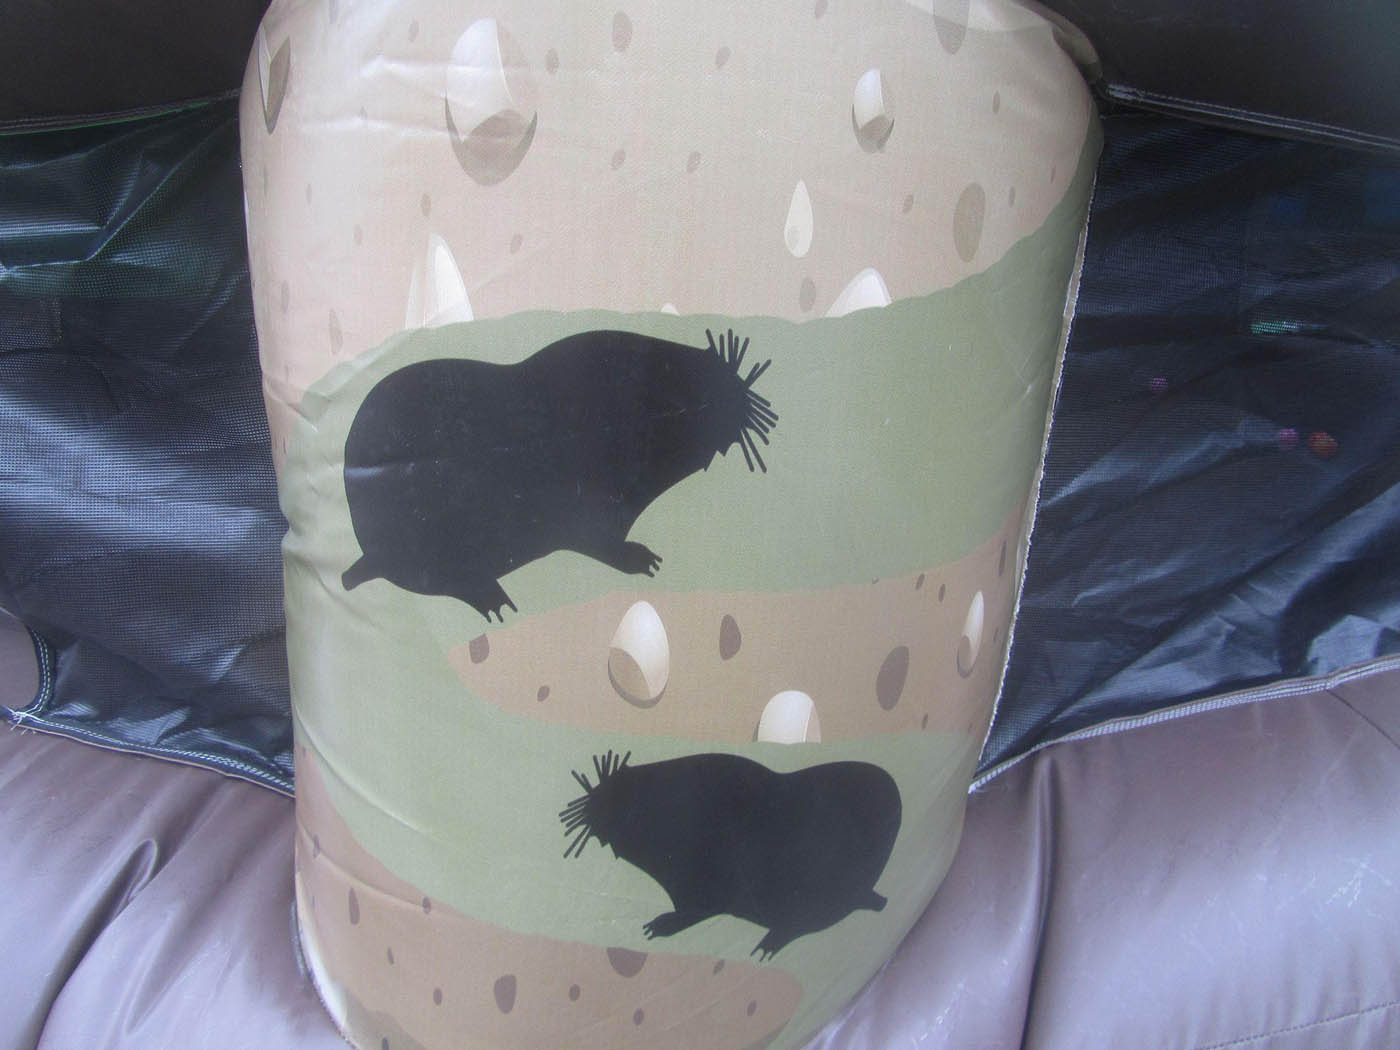 Inflatable Whack A Mole Artwork